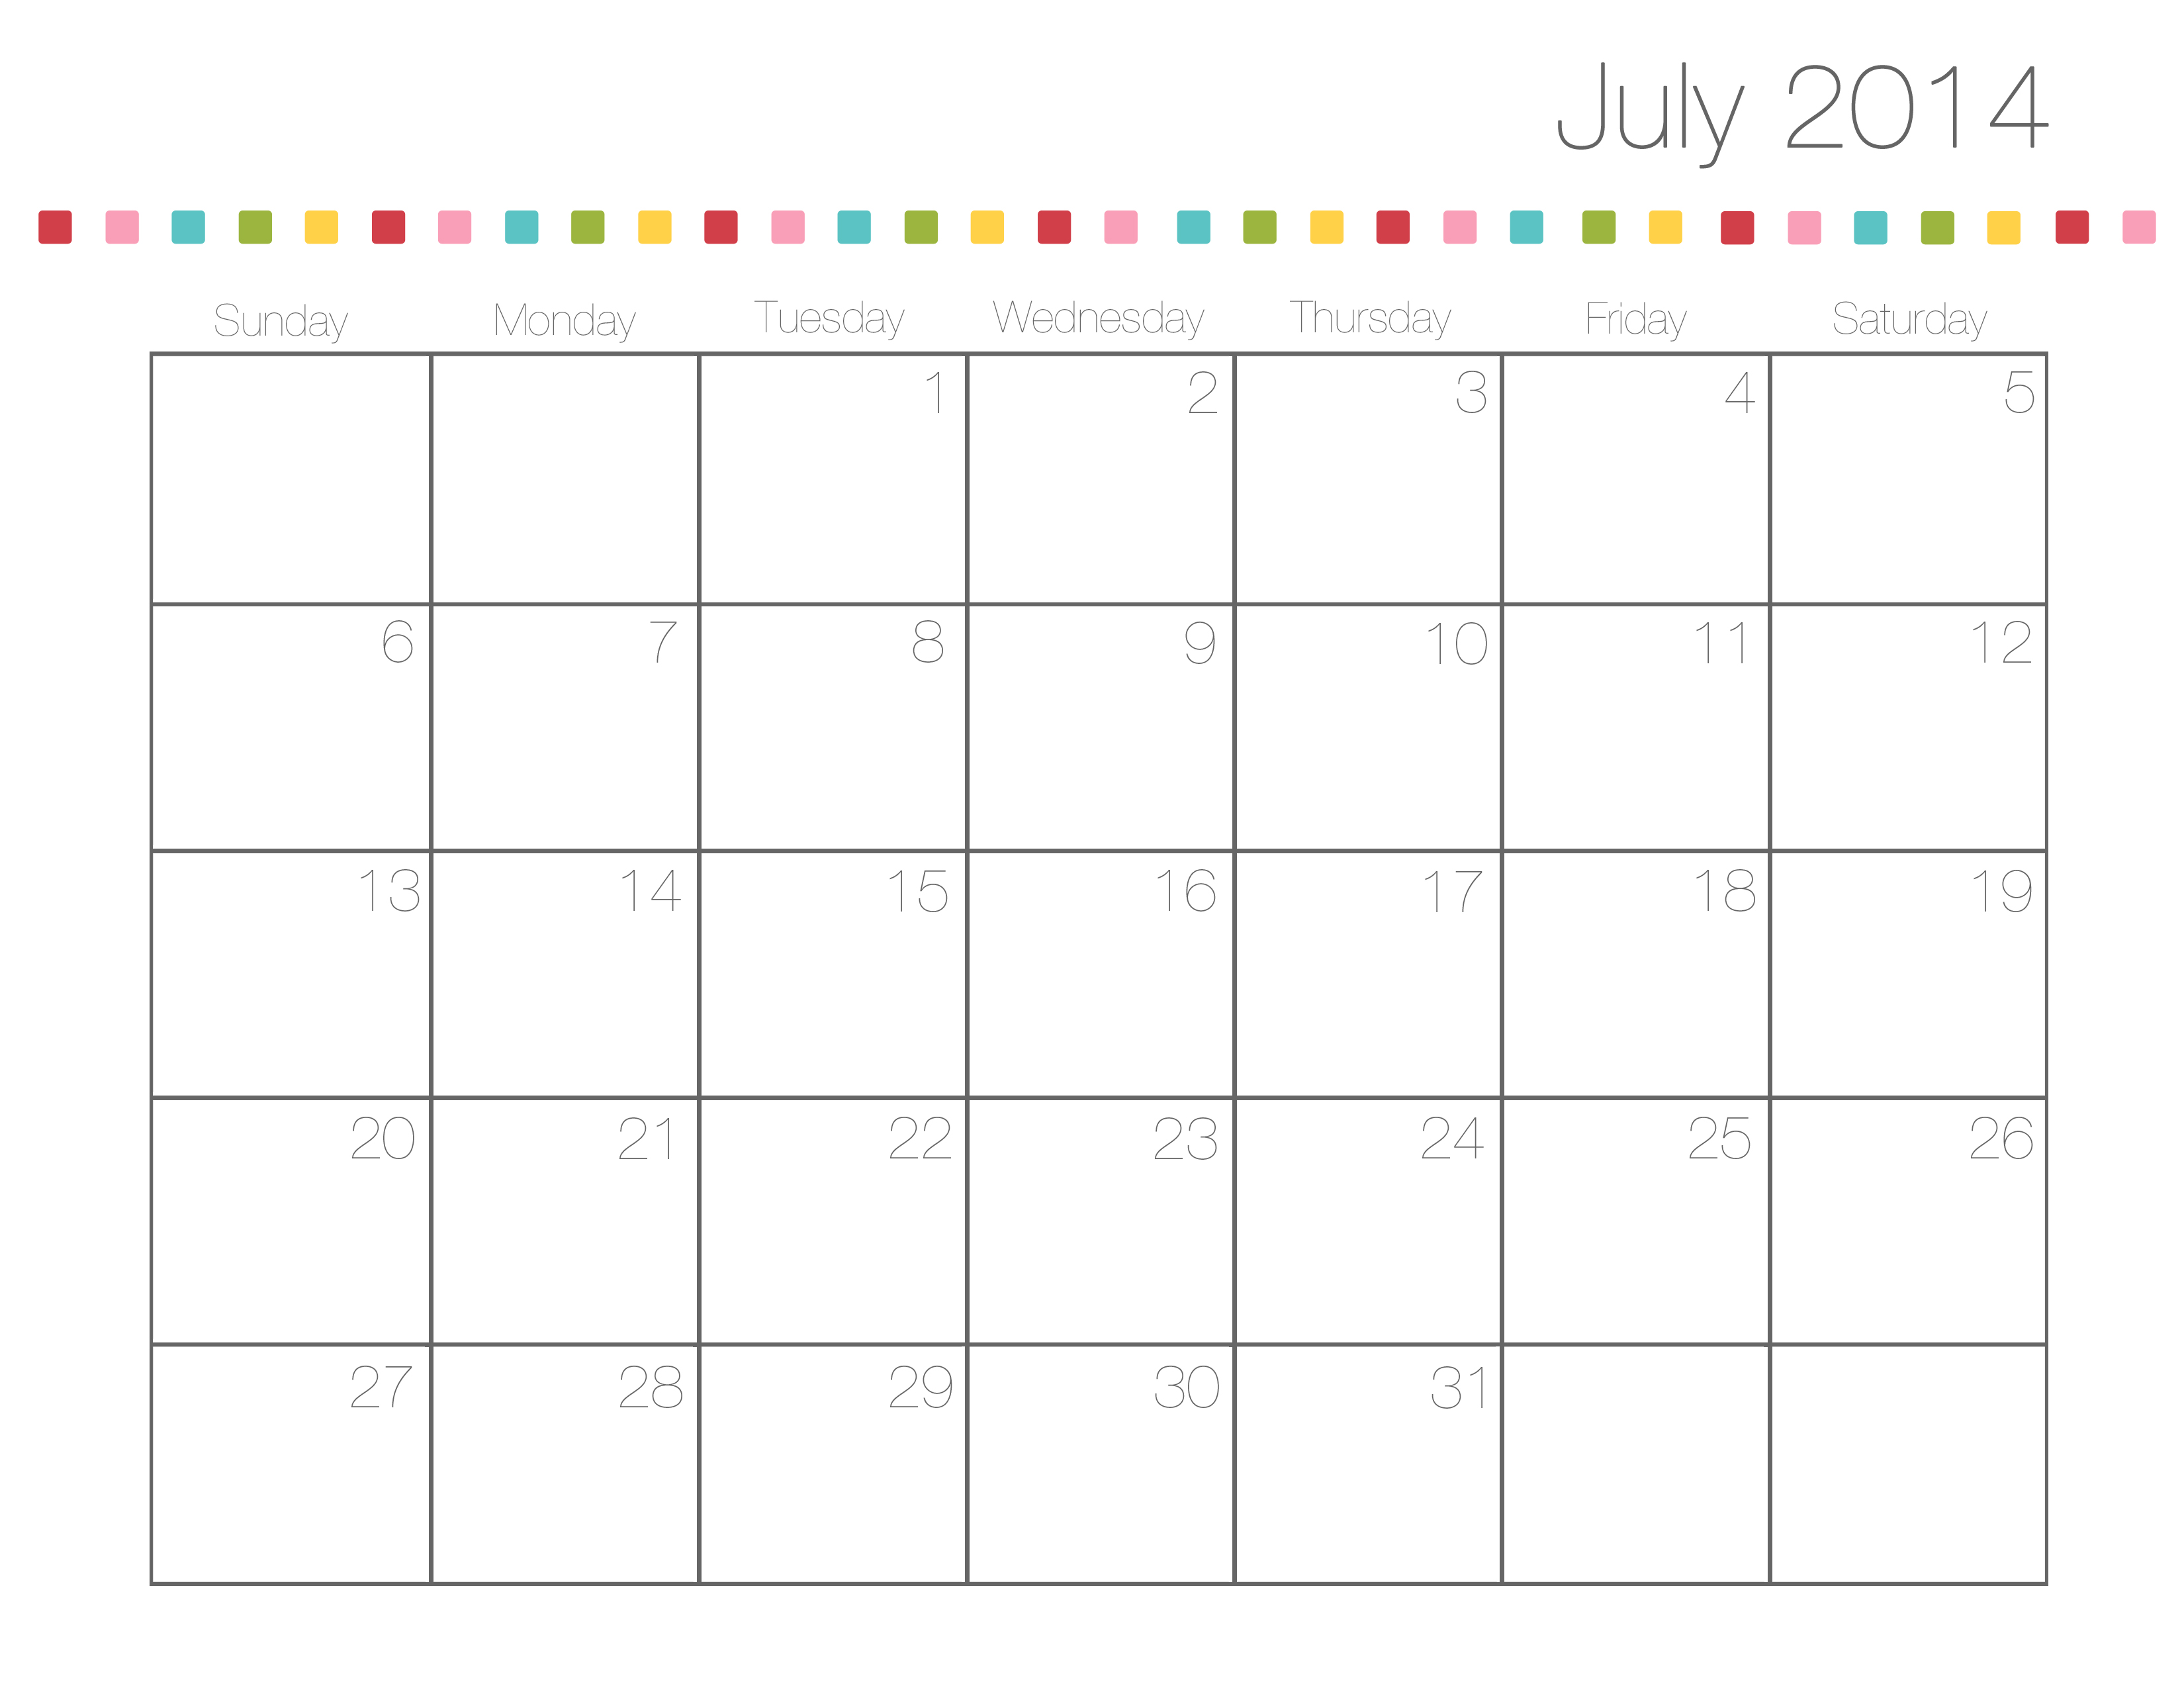 2014 Calendar December Template/page/2 | Search Results | Calendar ...